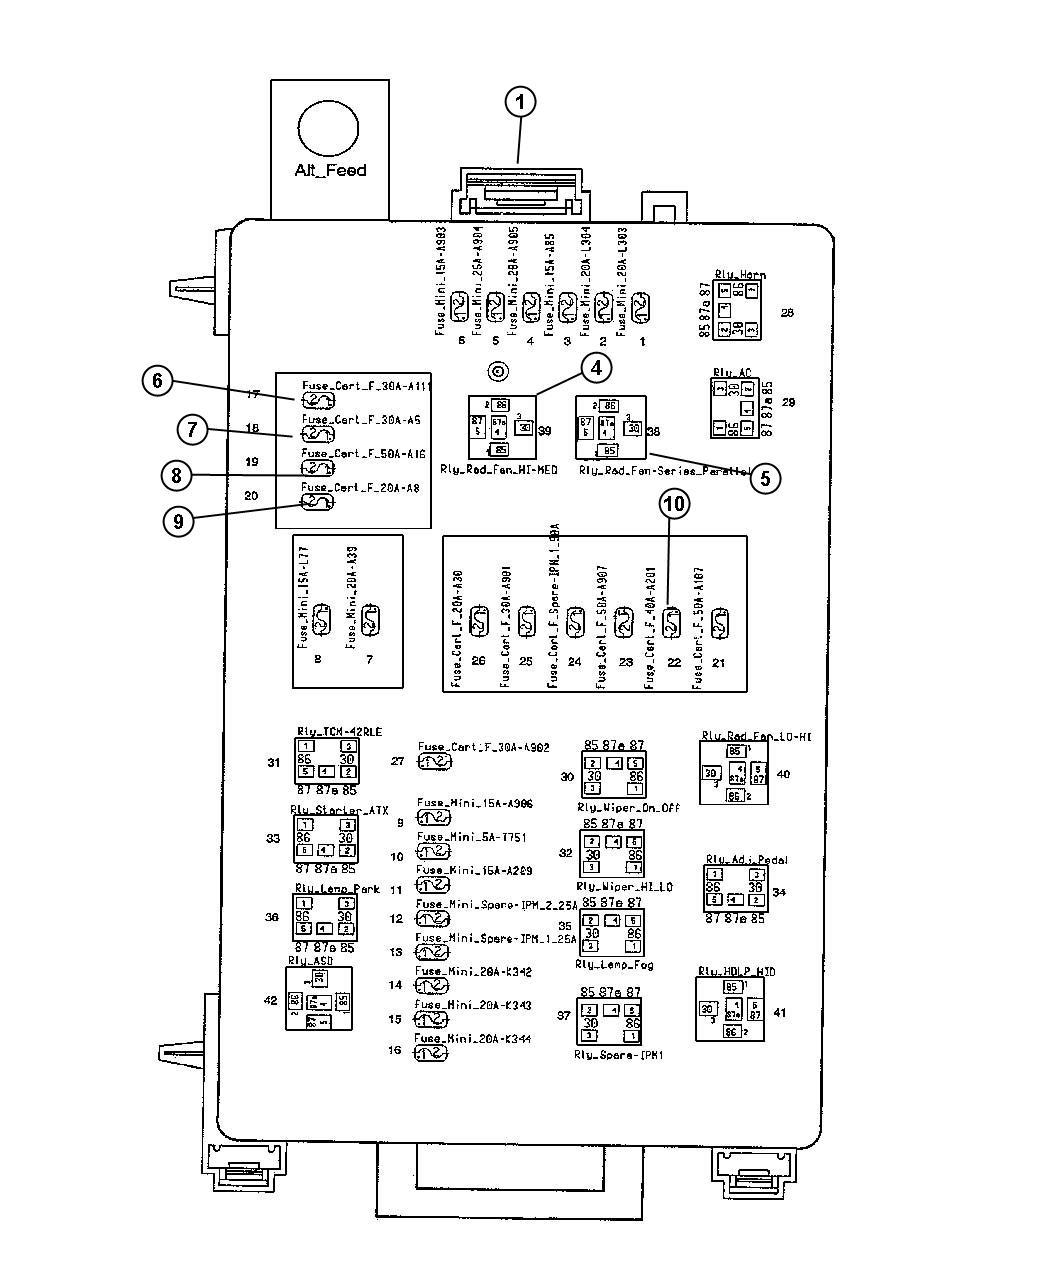 2016 Dodge Challenger Fuse  J Case  30 Amp  Adaptive